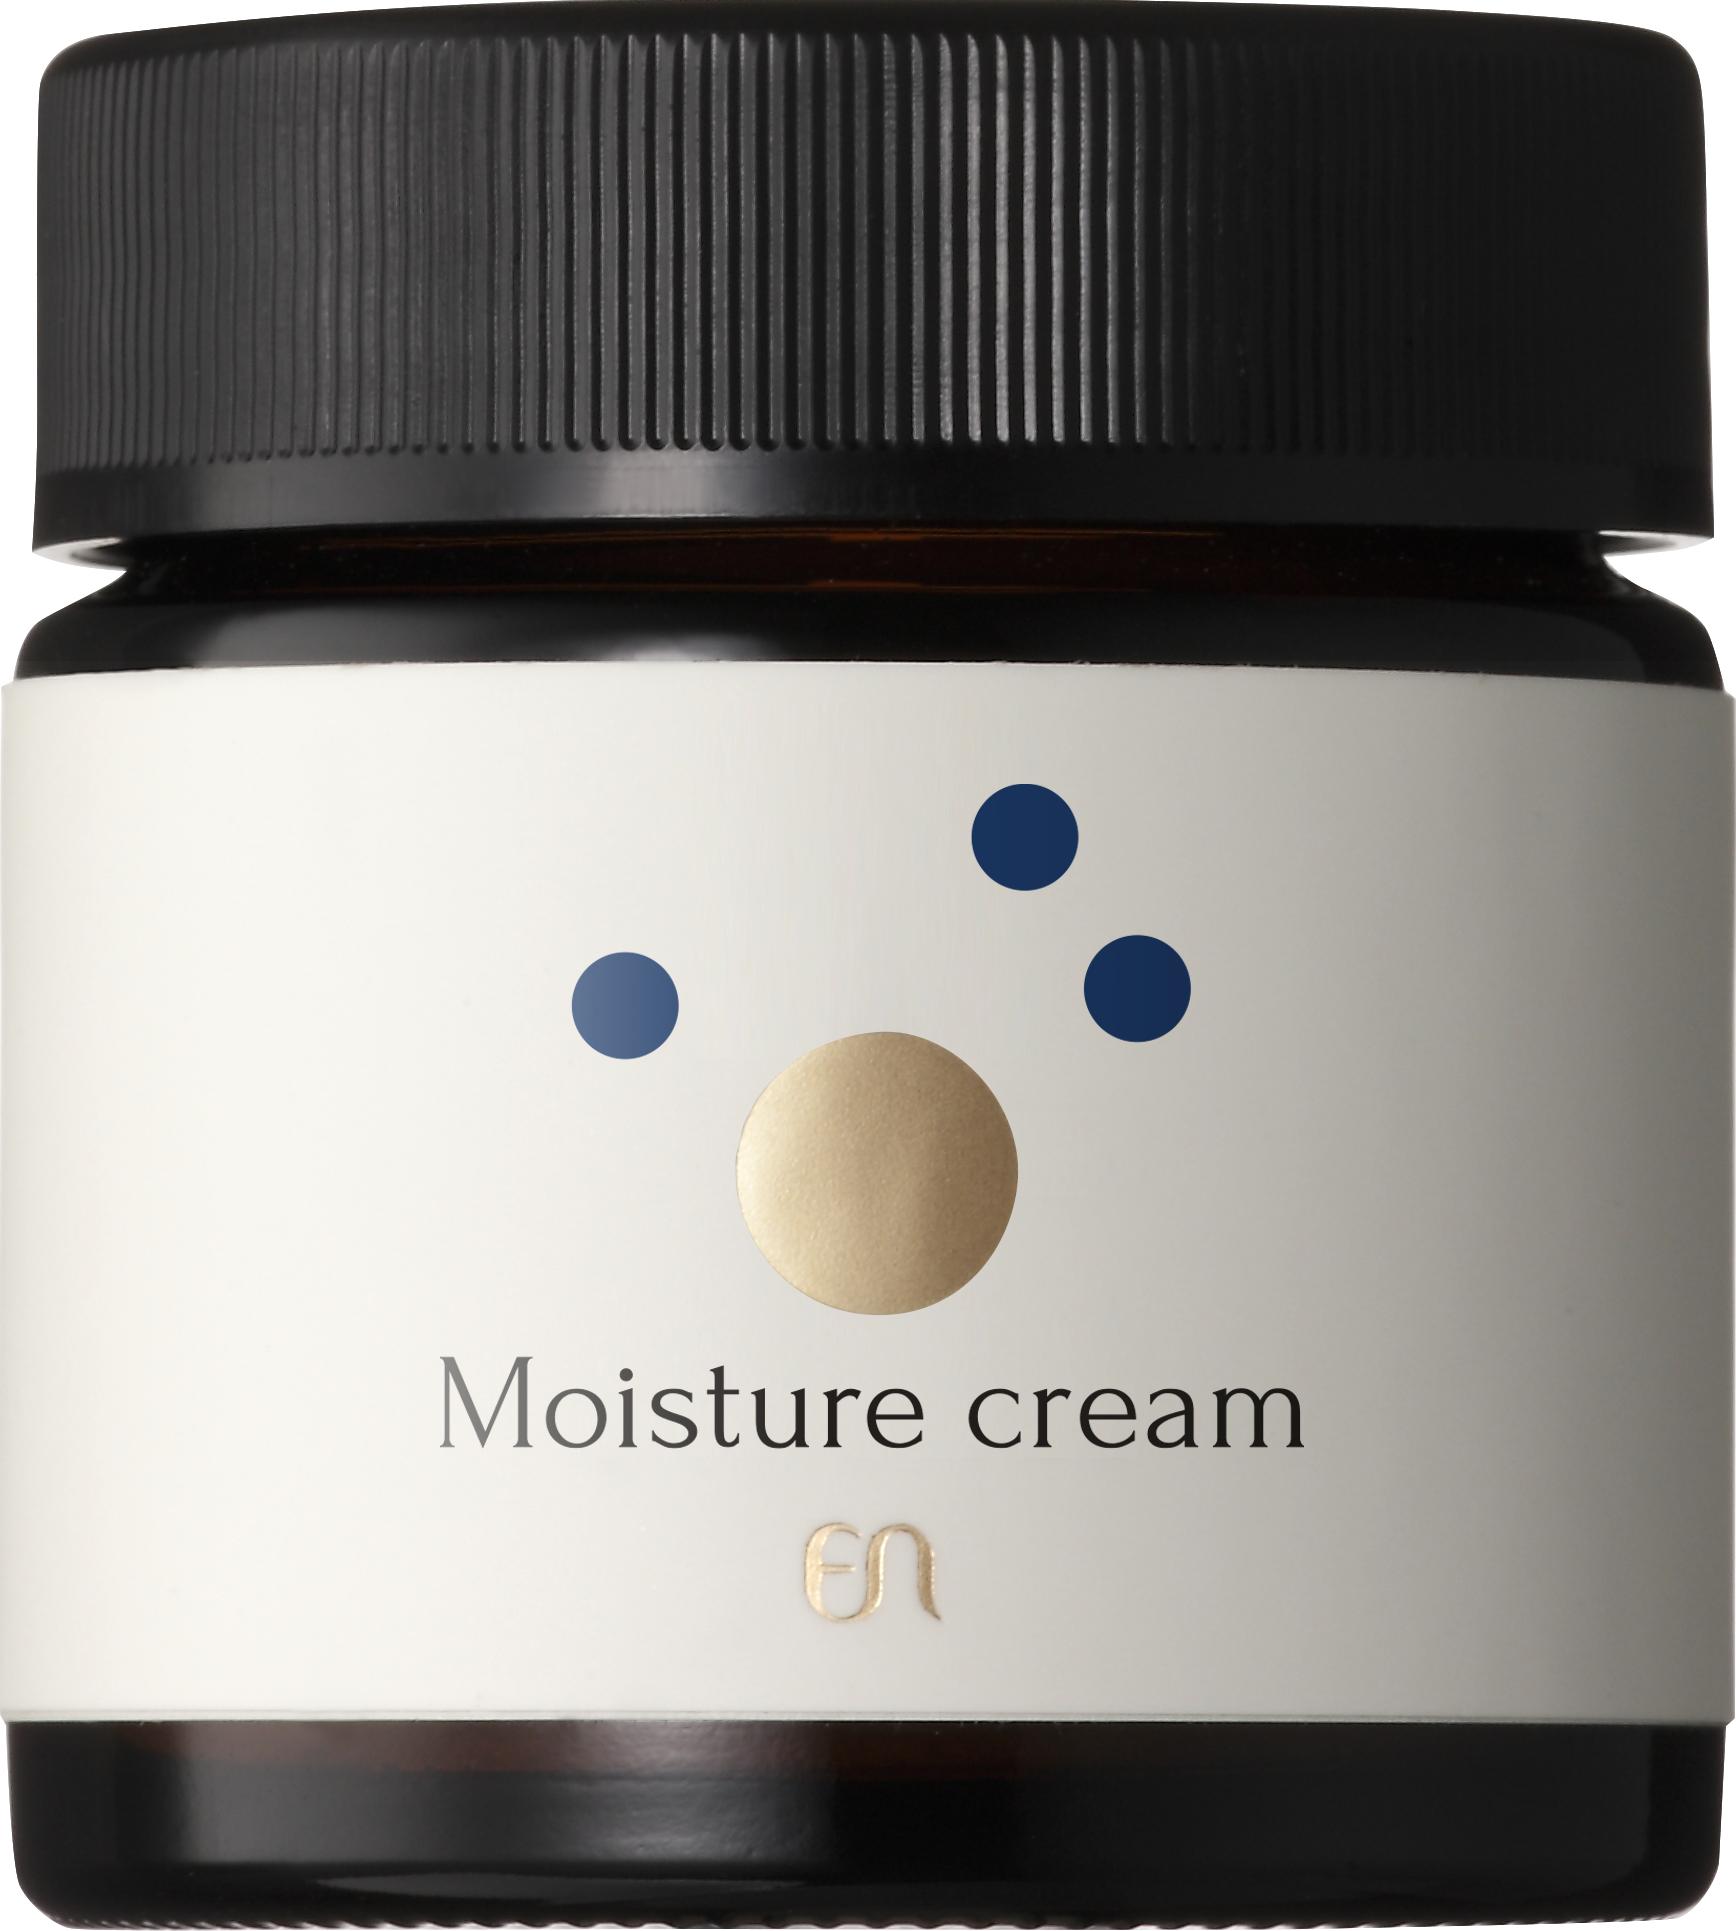 moisture_cream.jpg